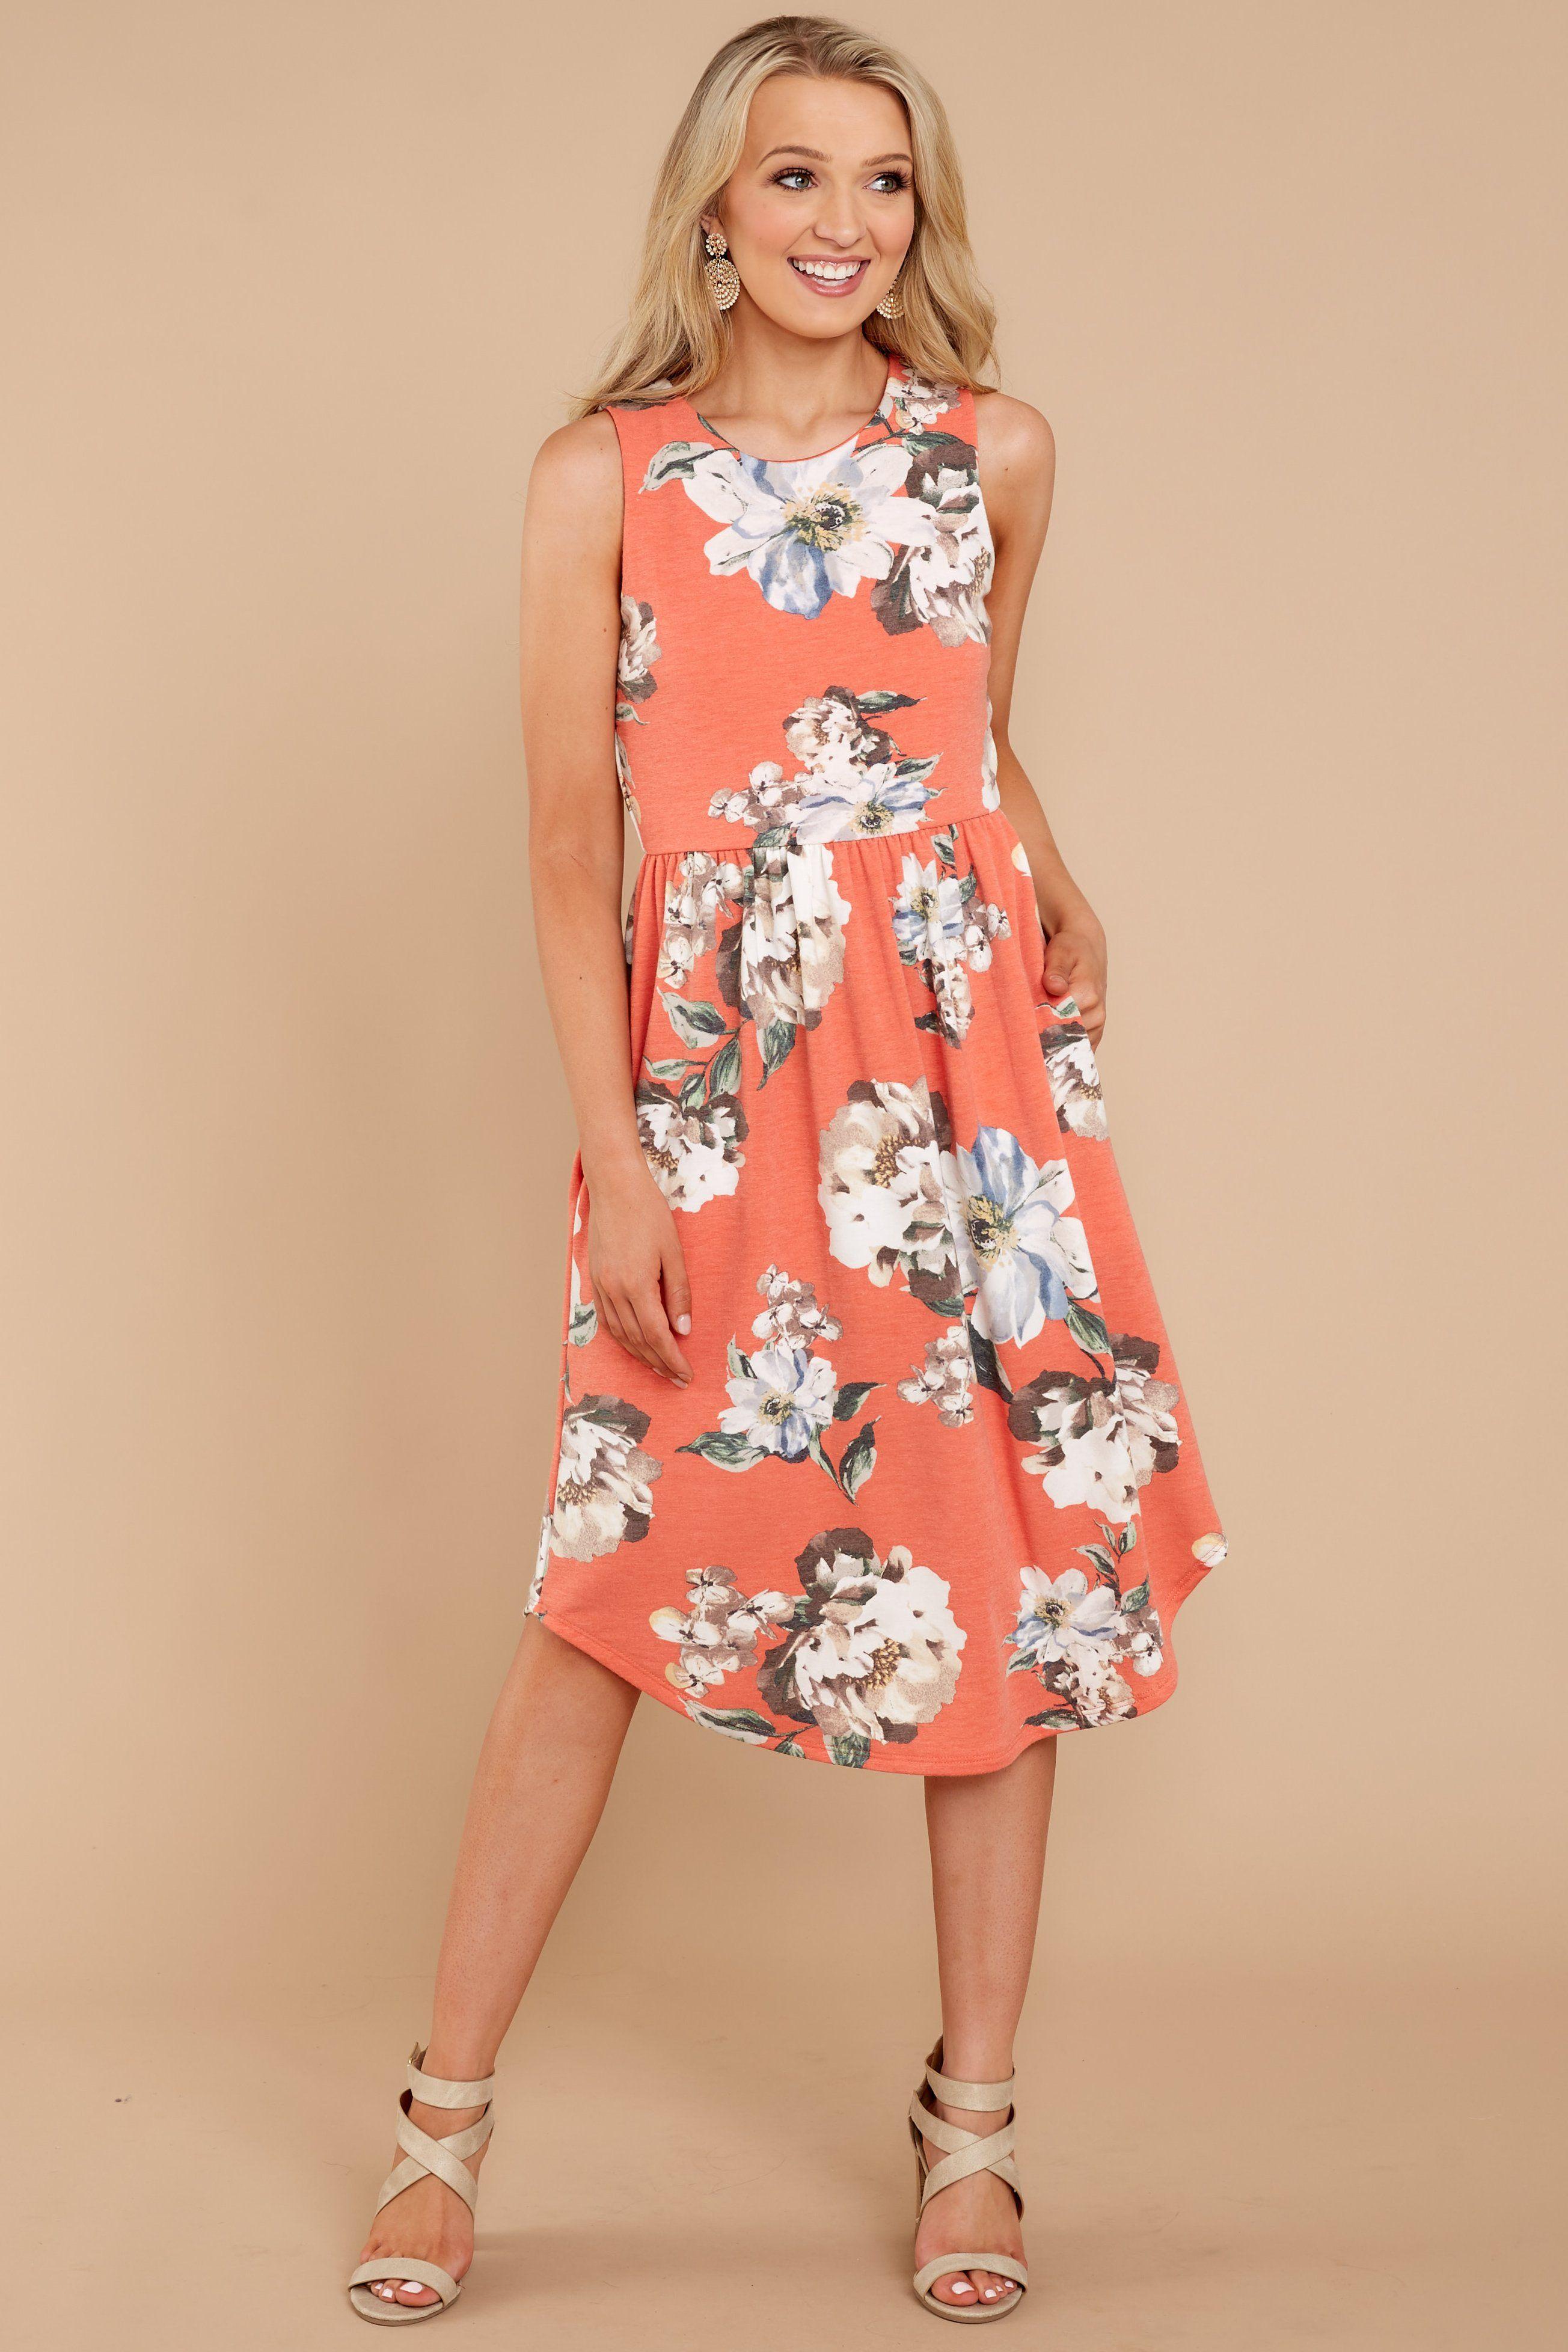 a07e6105ed Cute Floral Print Dress - Chic Dress - Dress -  42.00 – Red Dress Boutique